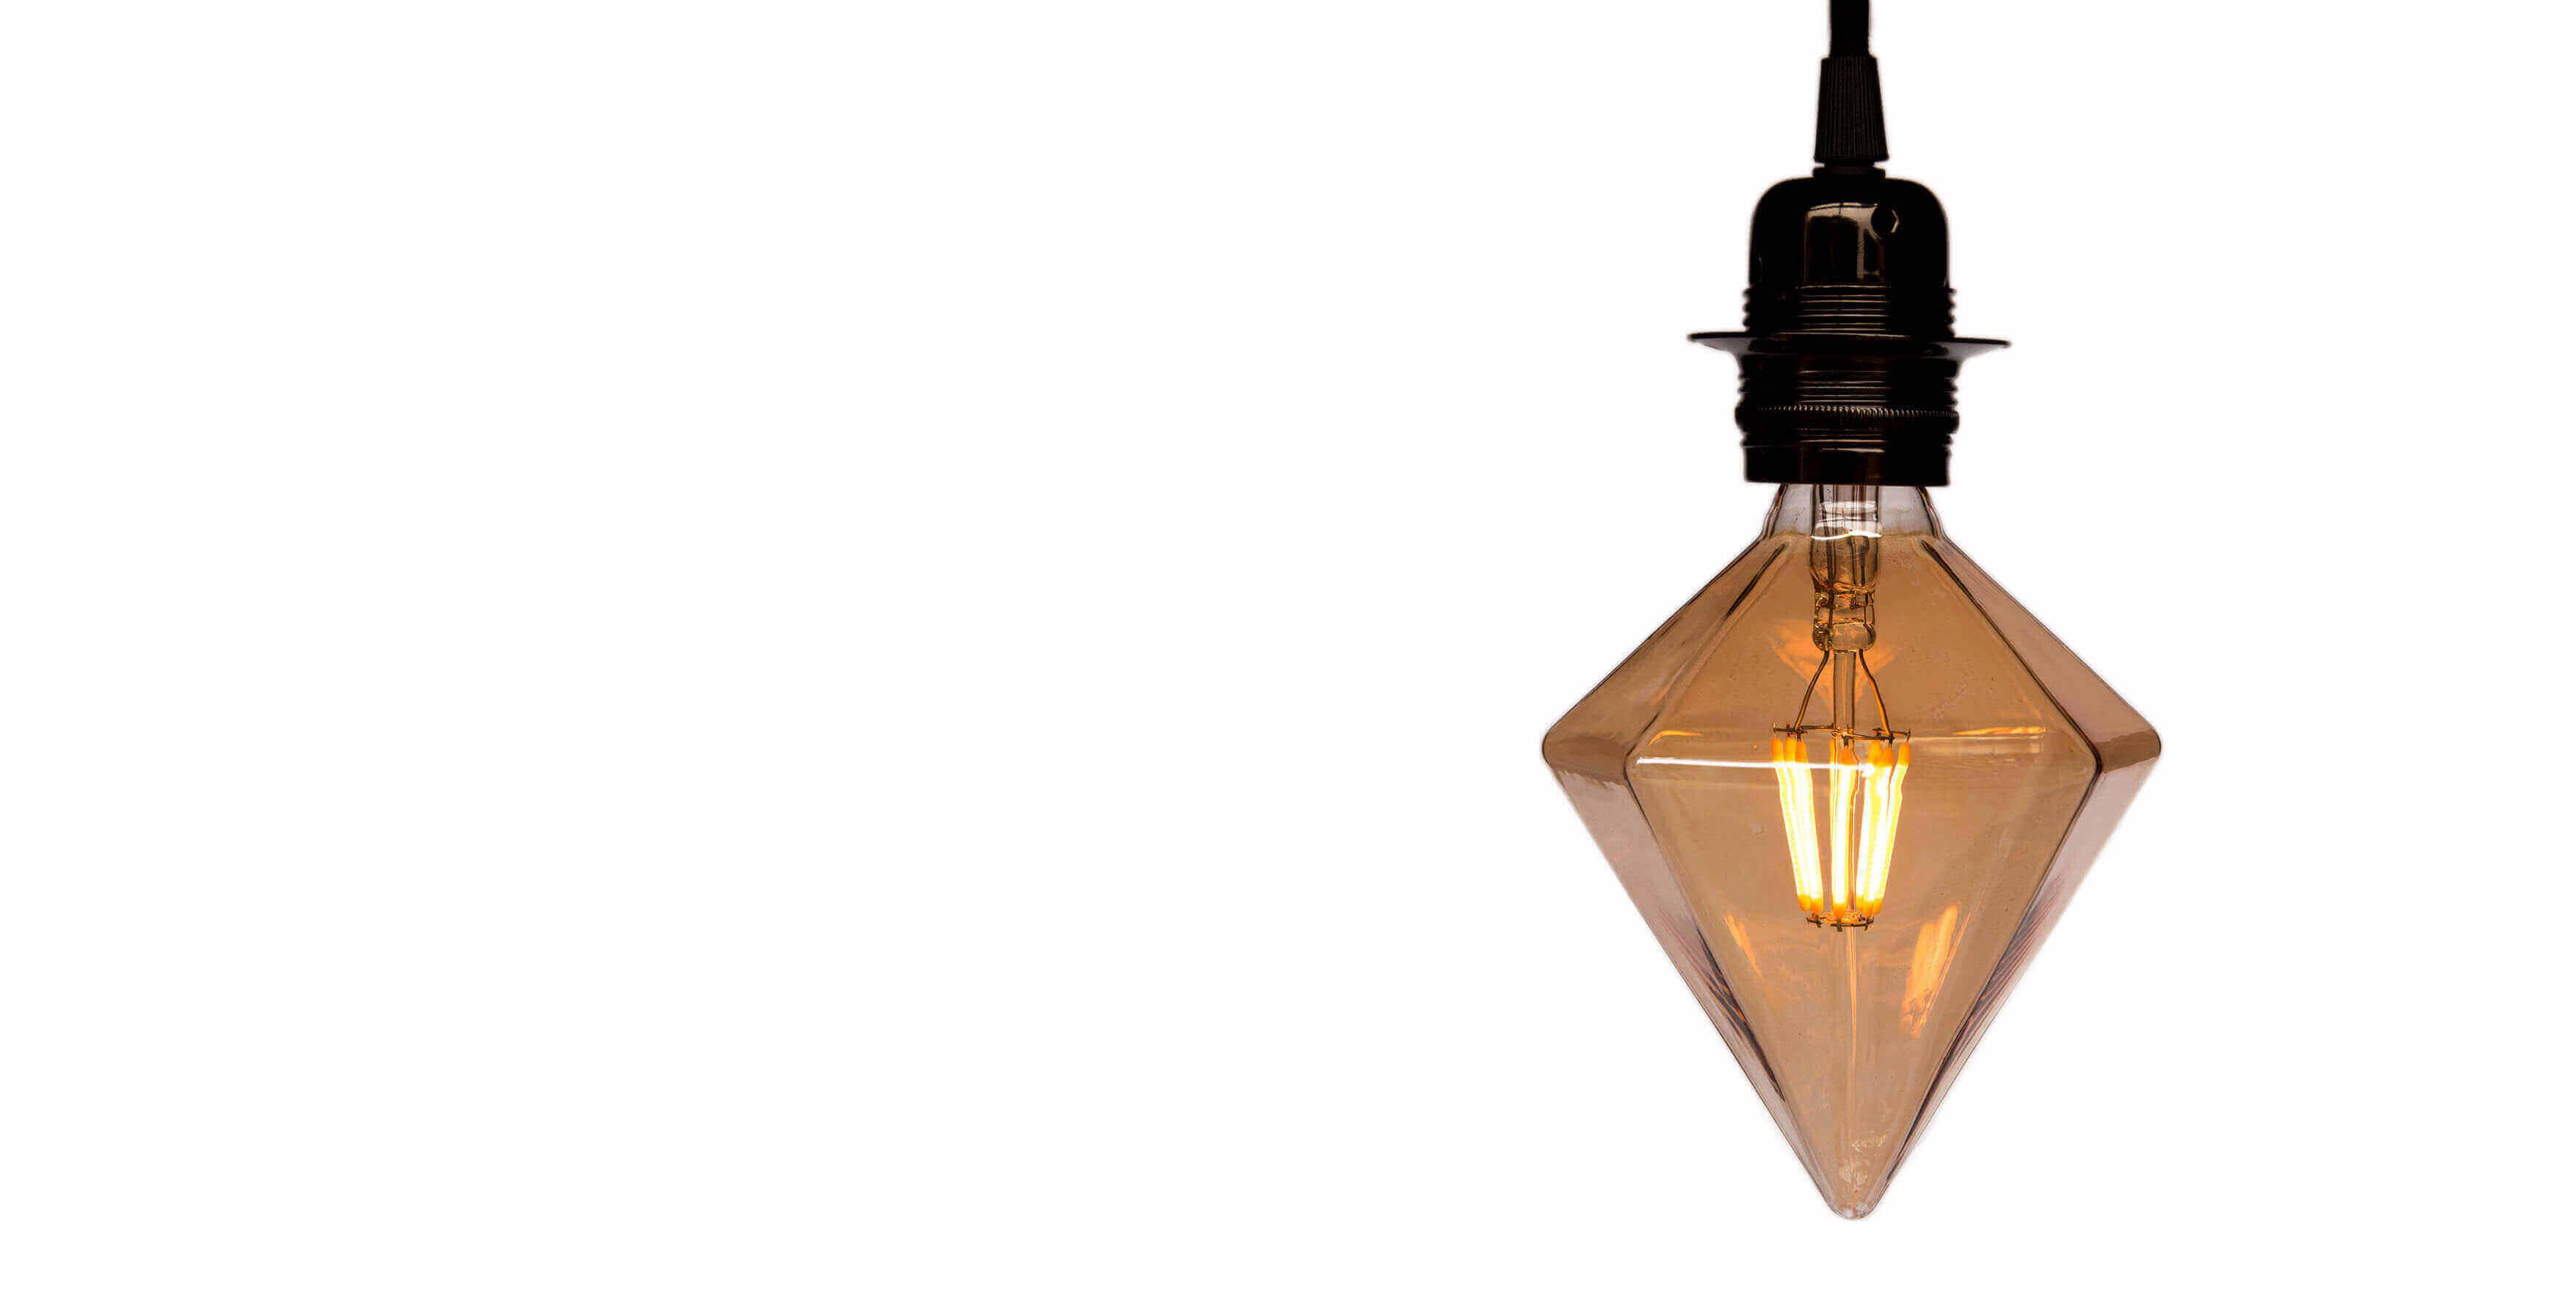 Teardrop st64 william and watson vintage edison bulb industrial light - Decorative Light Bulbs